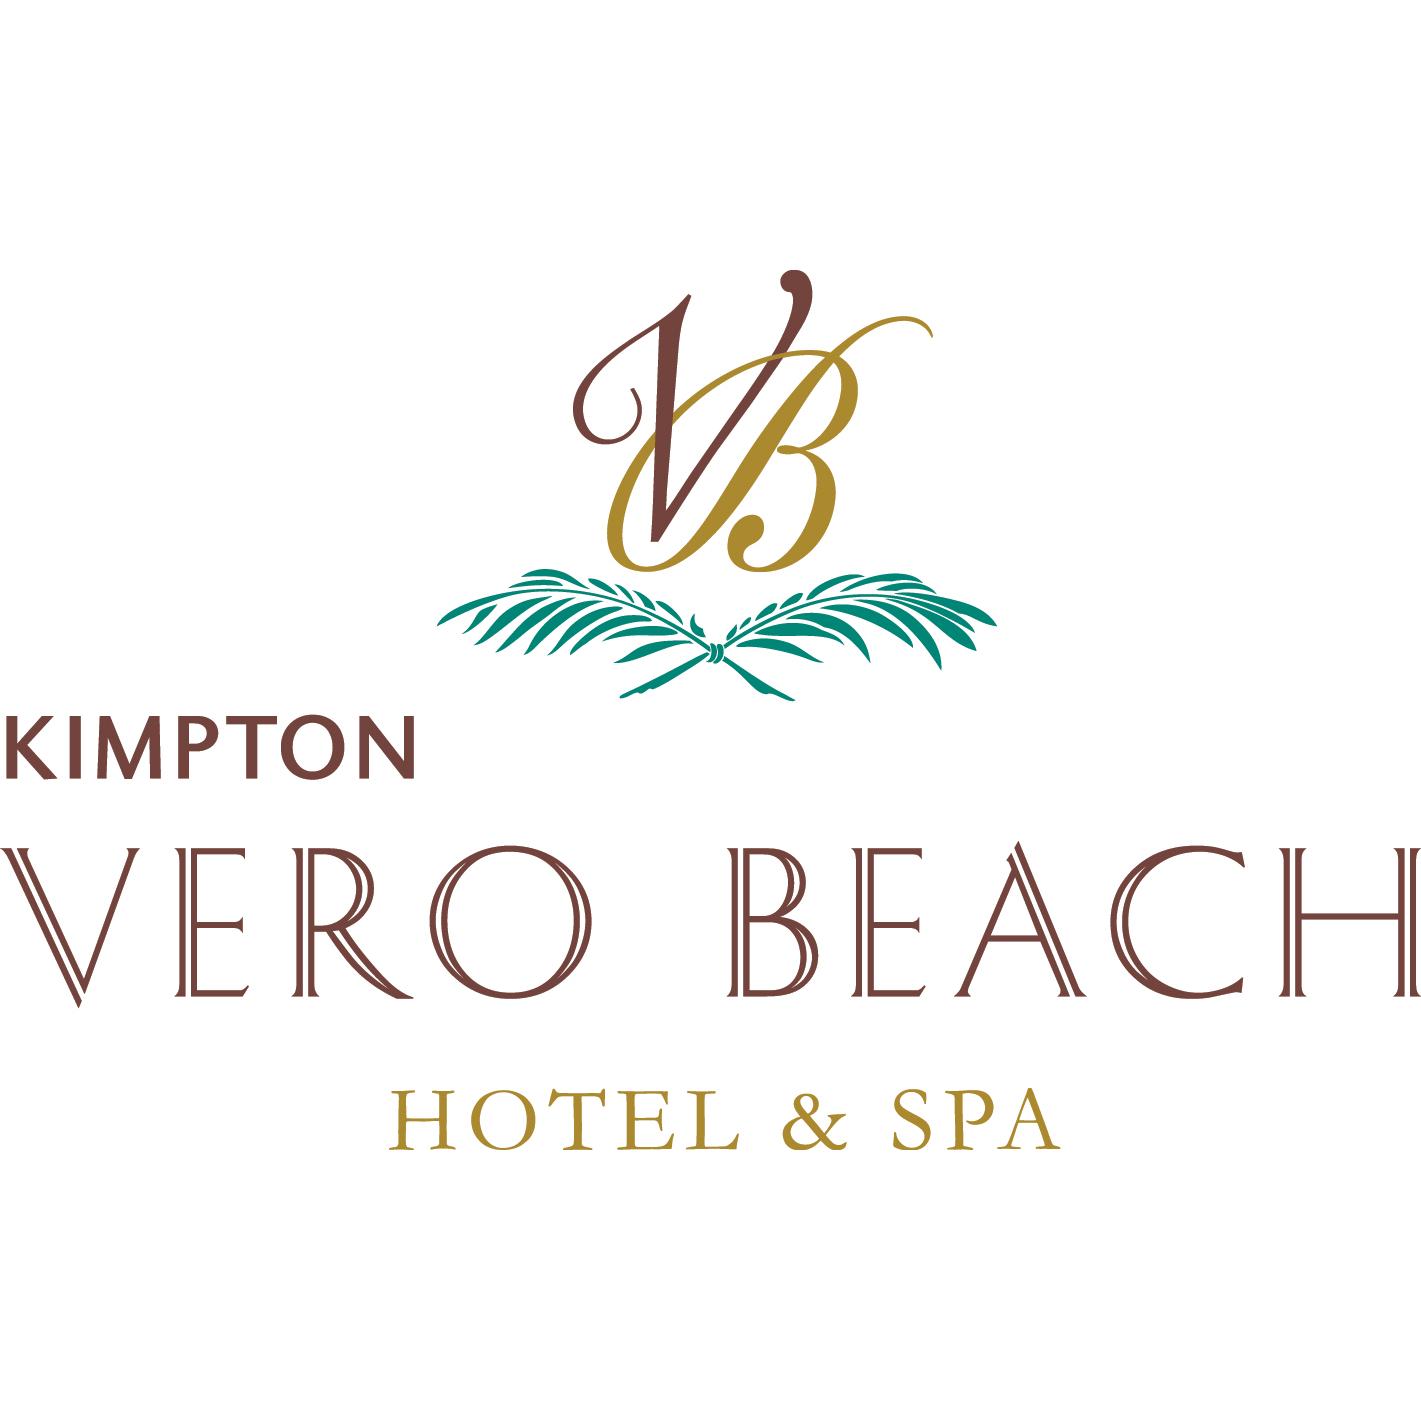 Kimpton vero beach hotel spa coupons near me in vero for Local spas near me